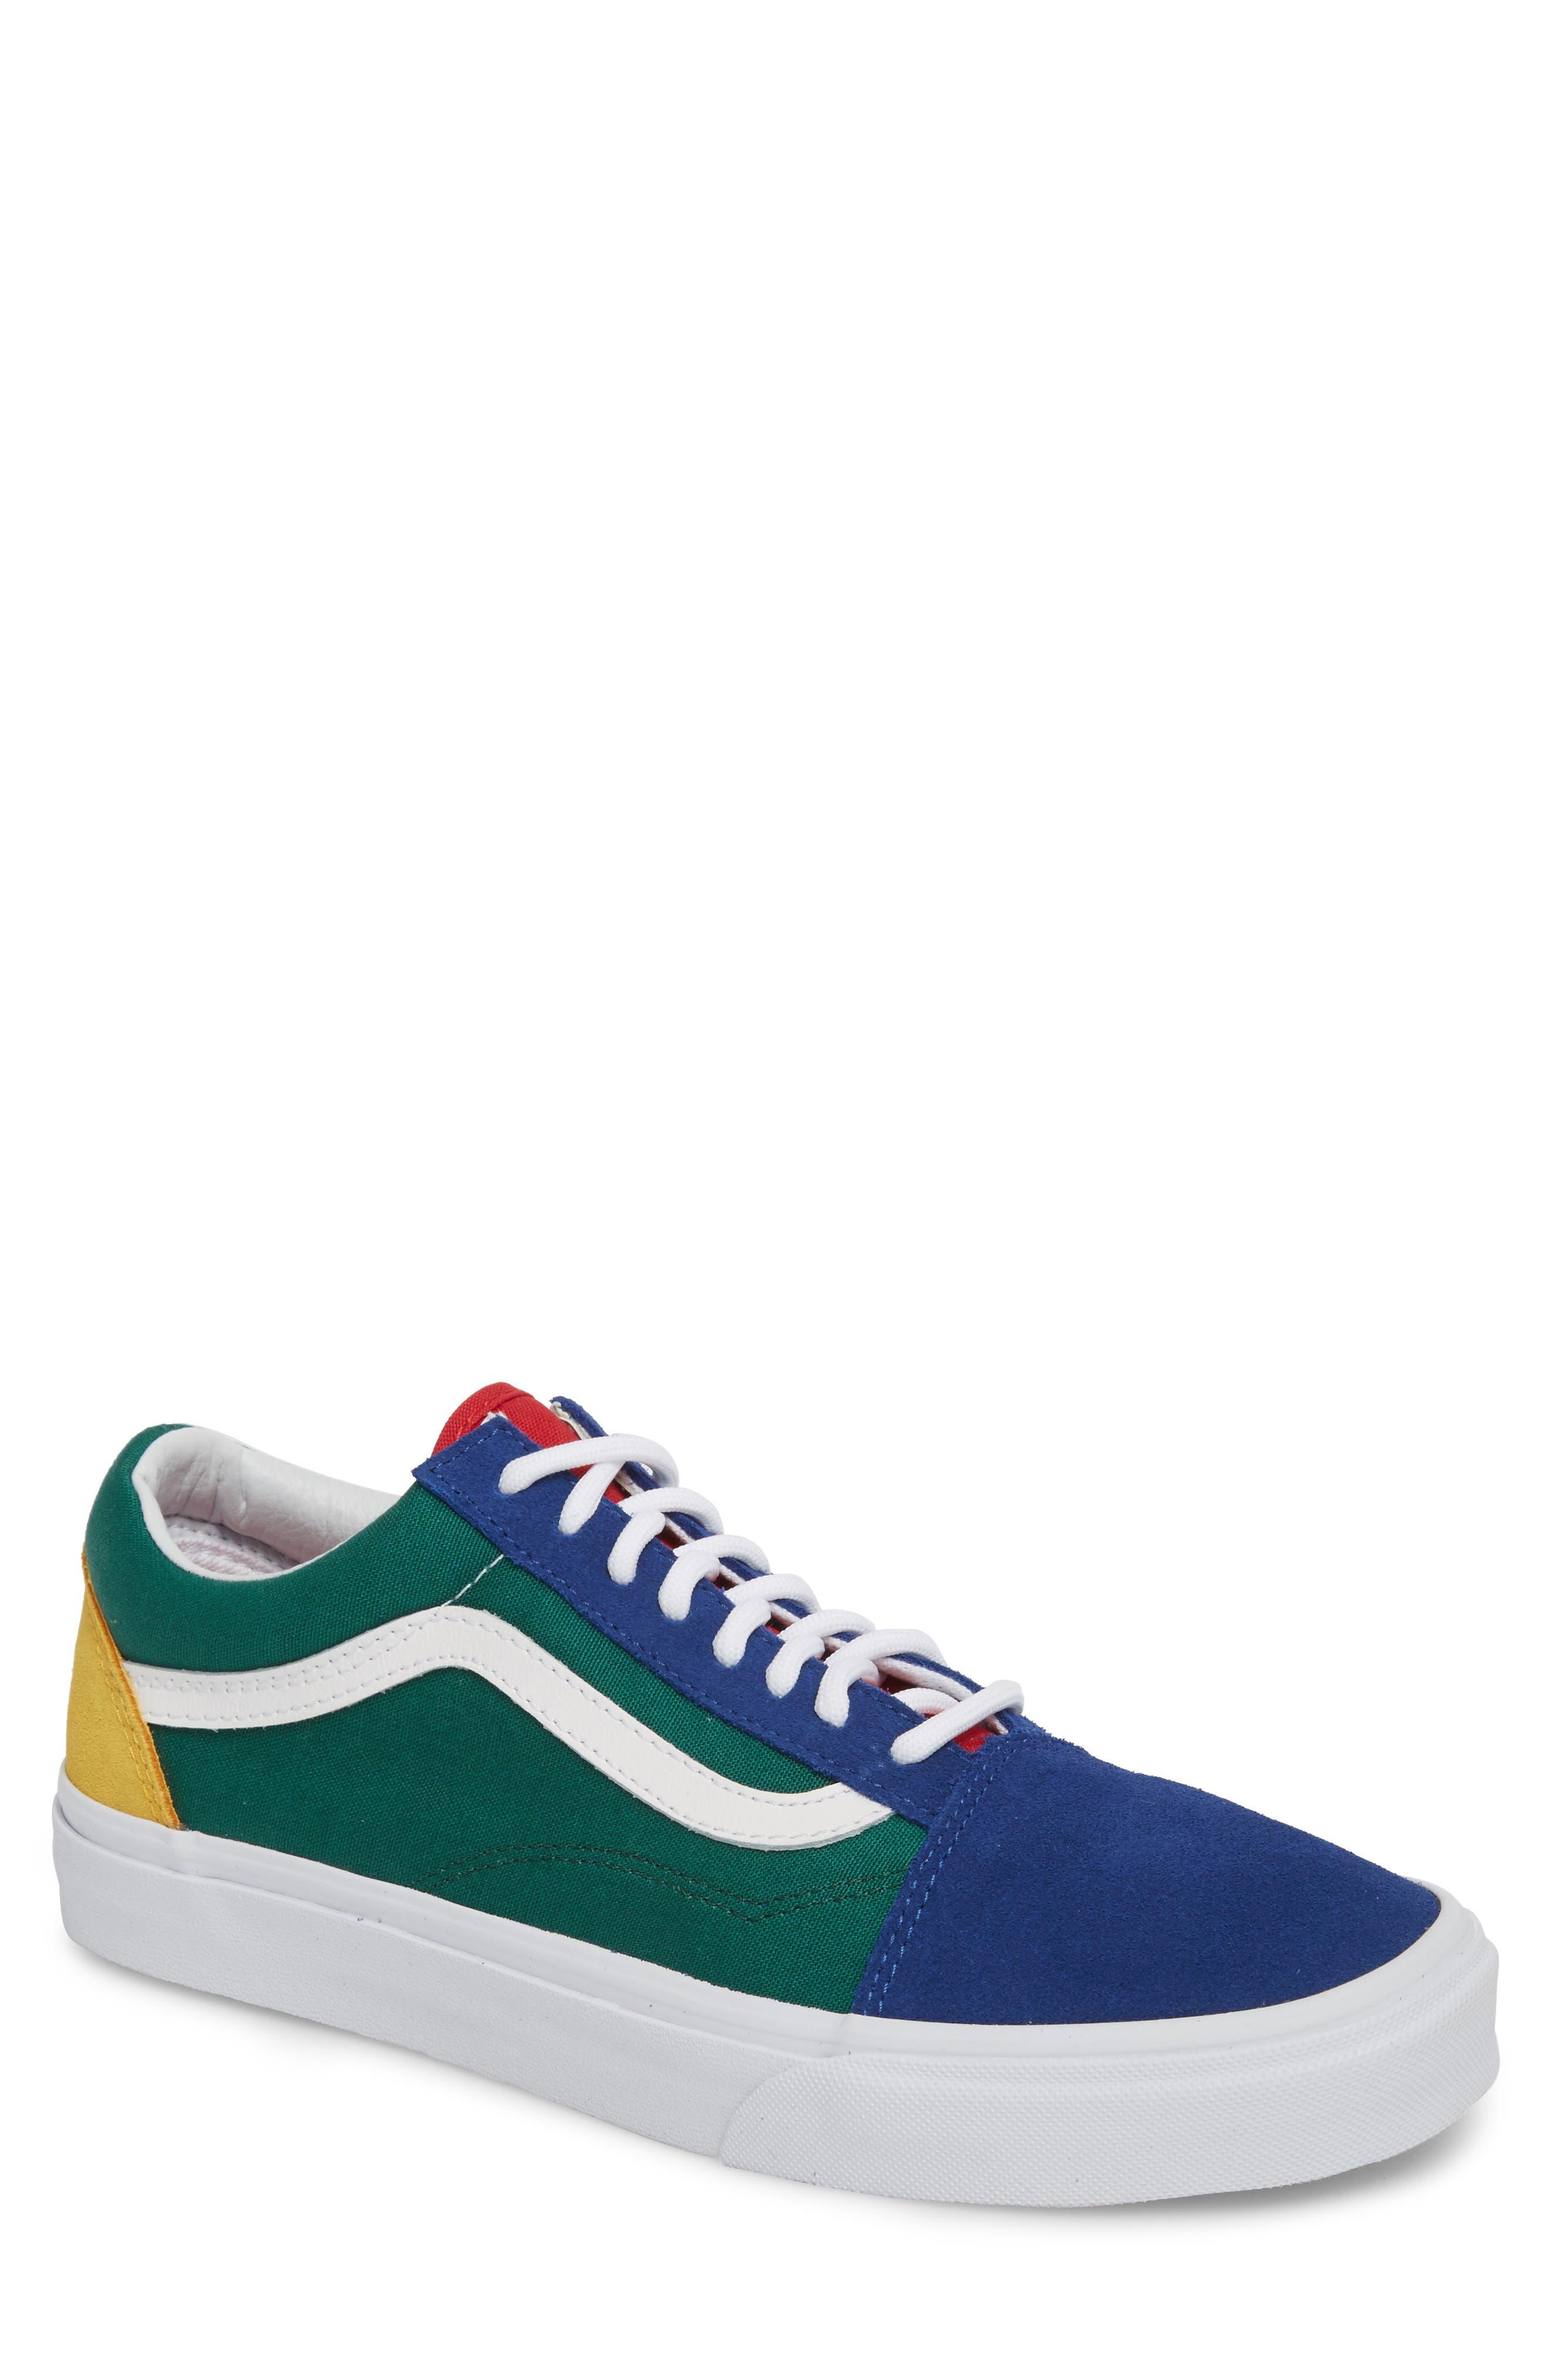 Yacht Club Old Skool Sneaker,                             Main thumbnail 1, color,                             300